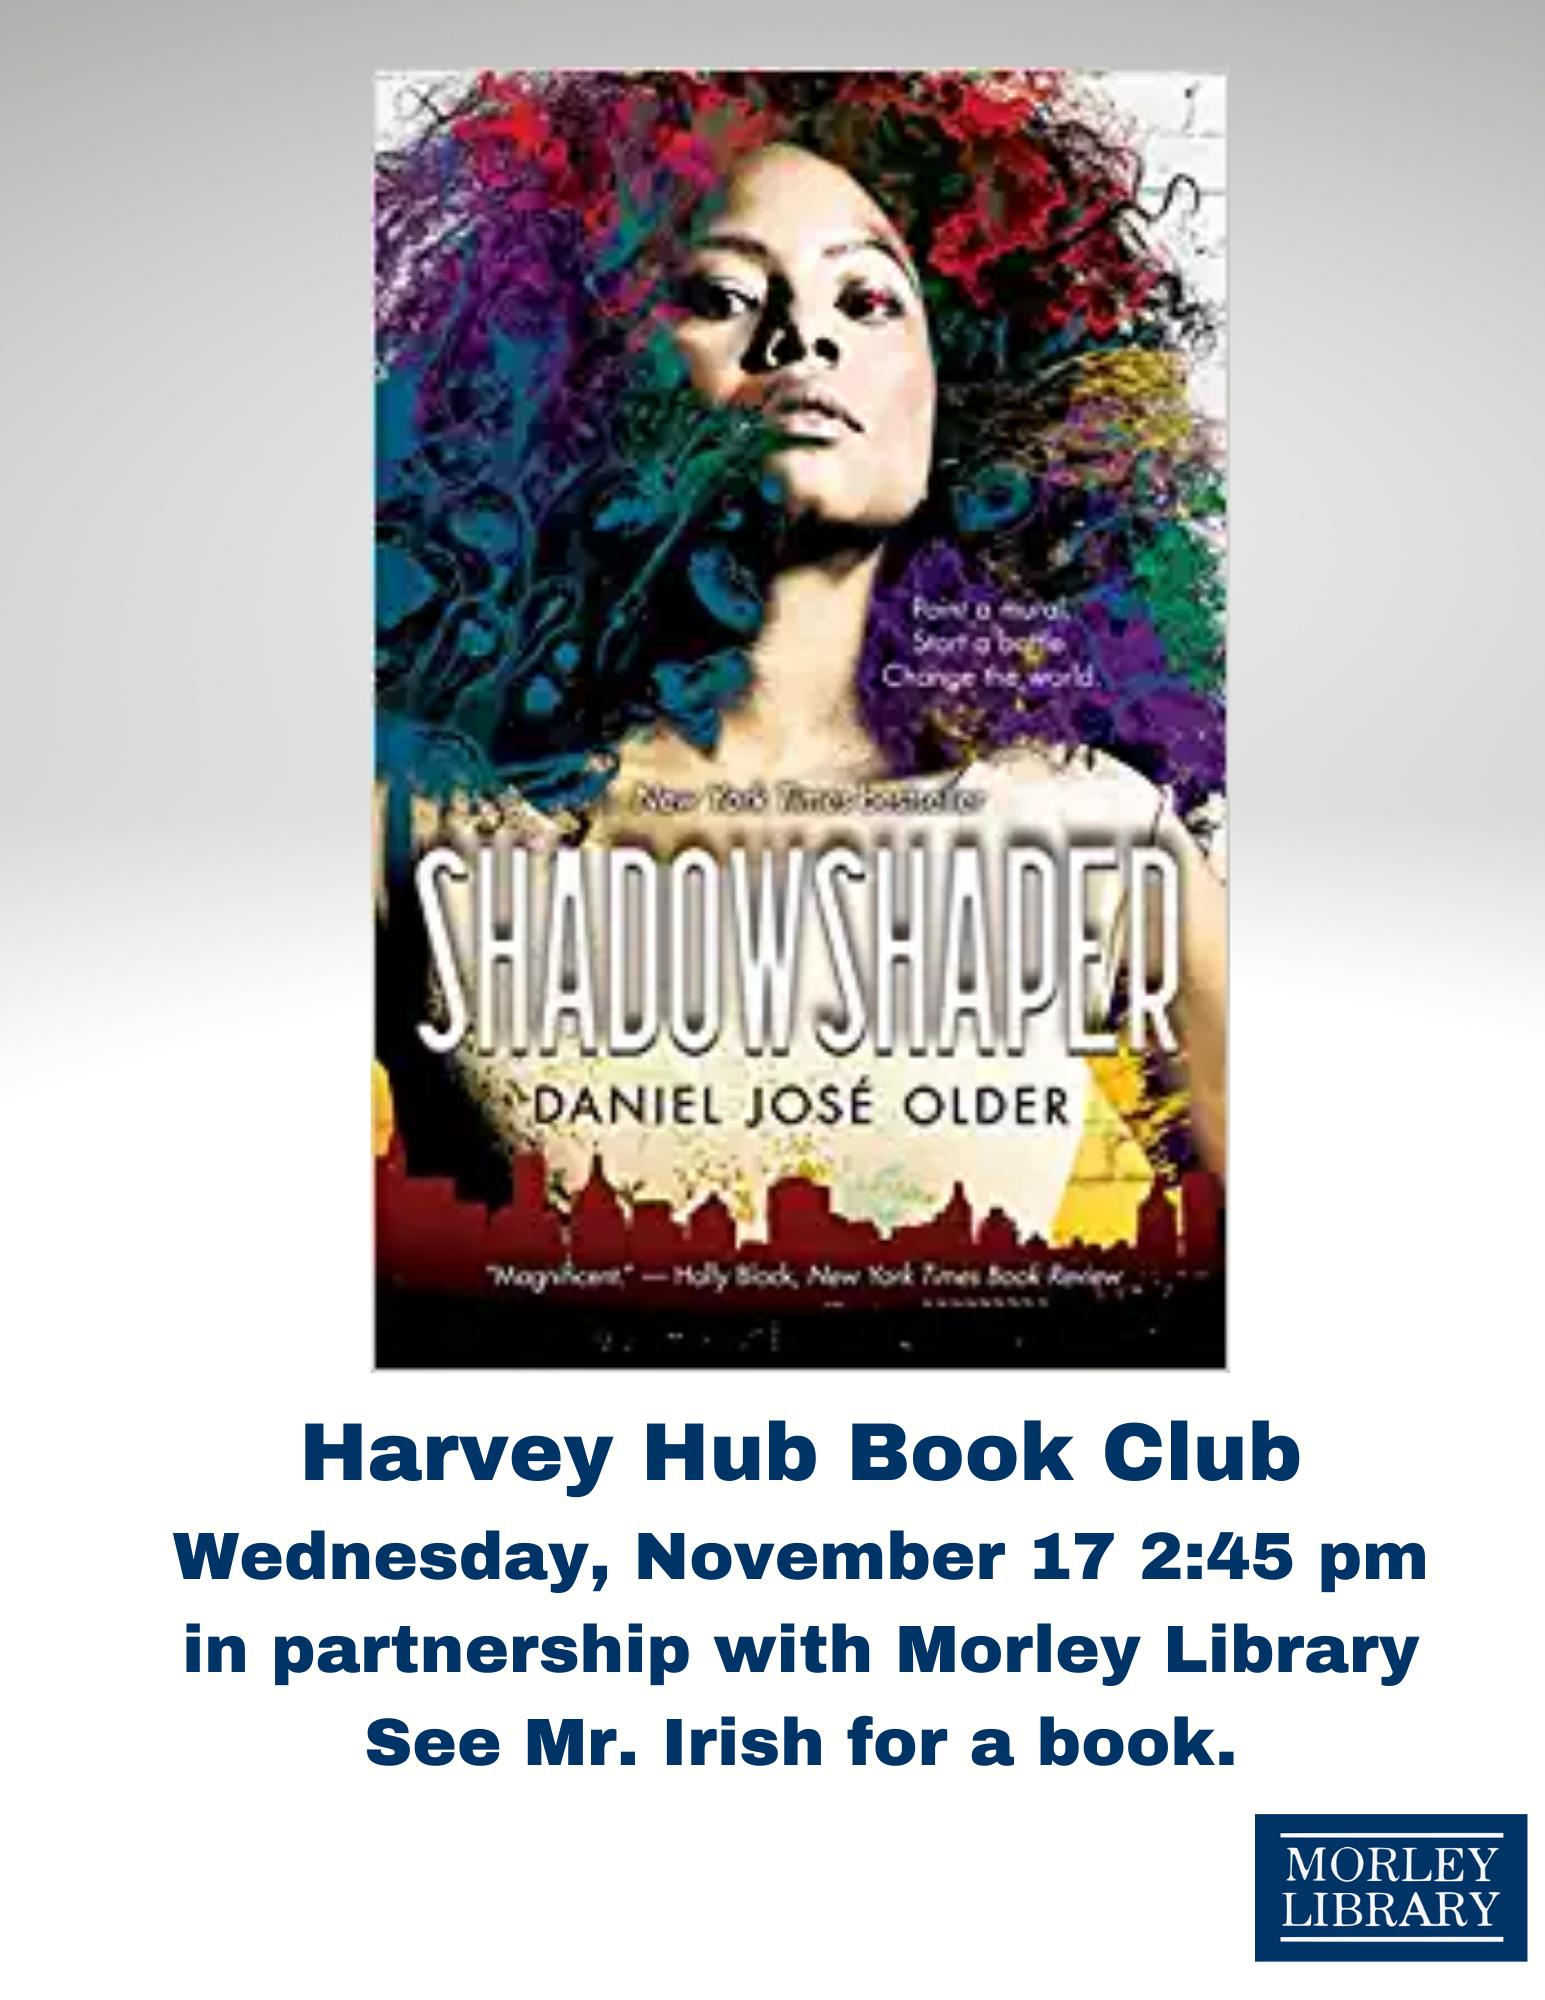 Harvey Hub Book Club: Shadowshaper by Daniel Jose Older